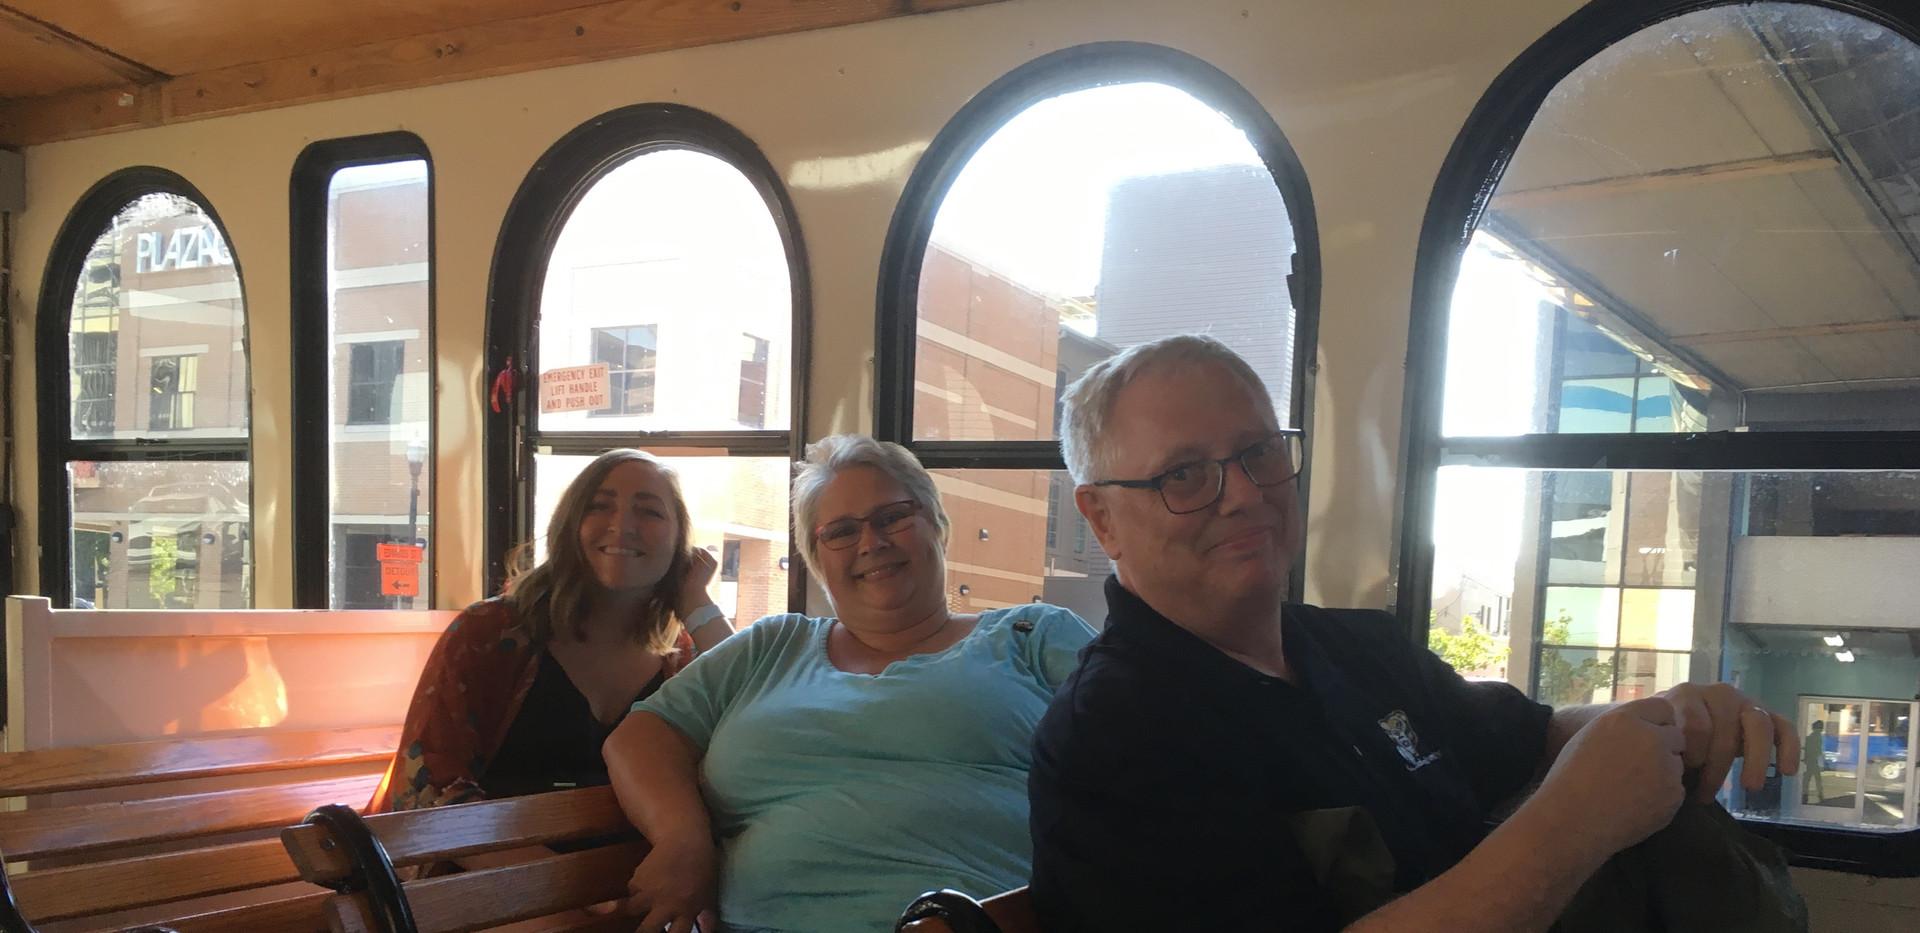 Cheryl LeClaire, Chelsea, and Steve Kent